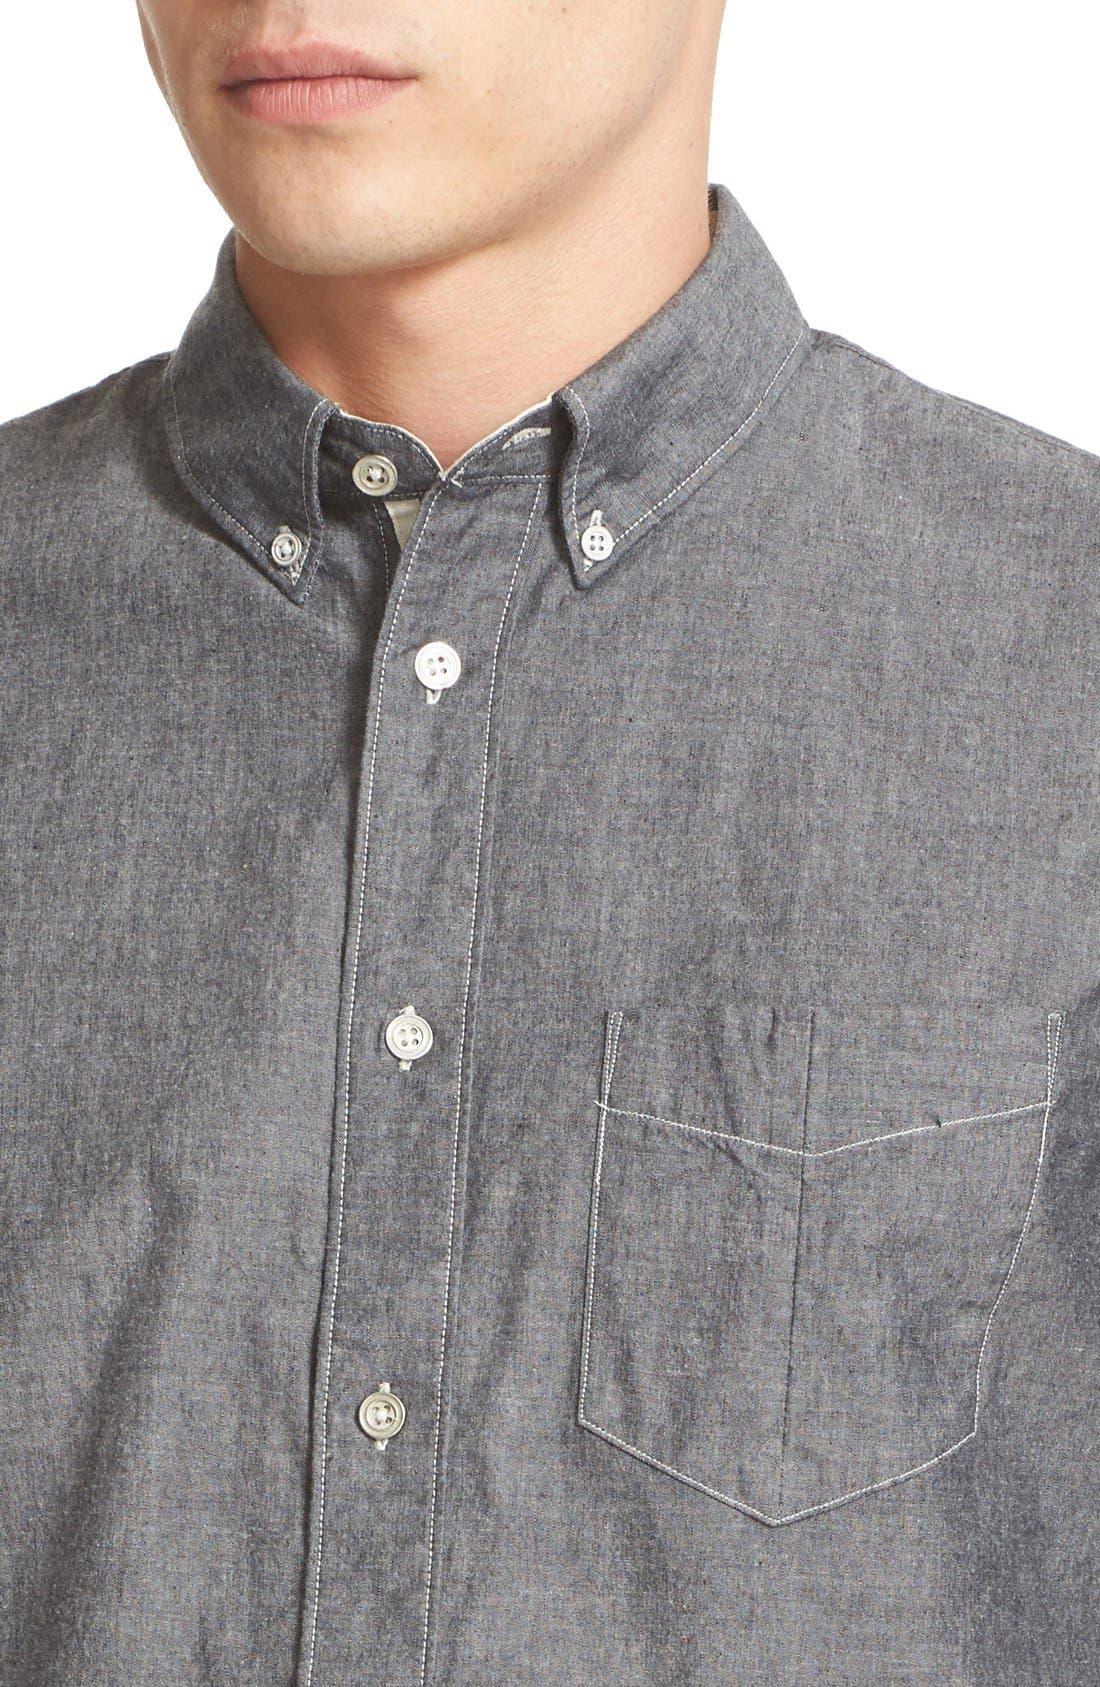 Trim Fit Chambray Shirt,                             Alternate thumbnail 5, color,                             020